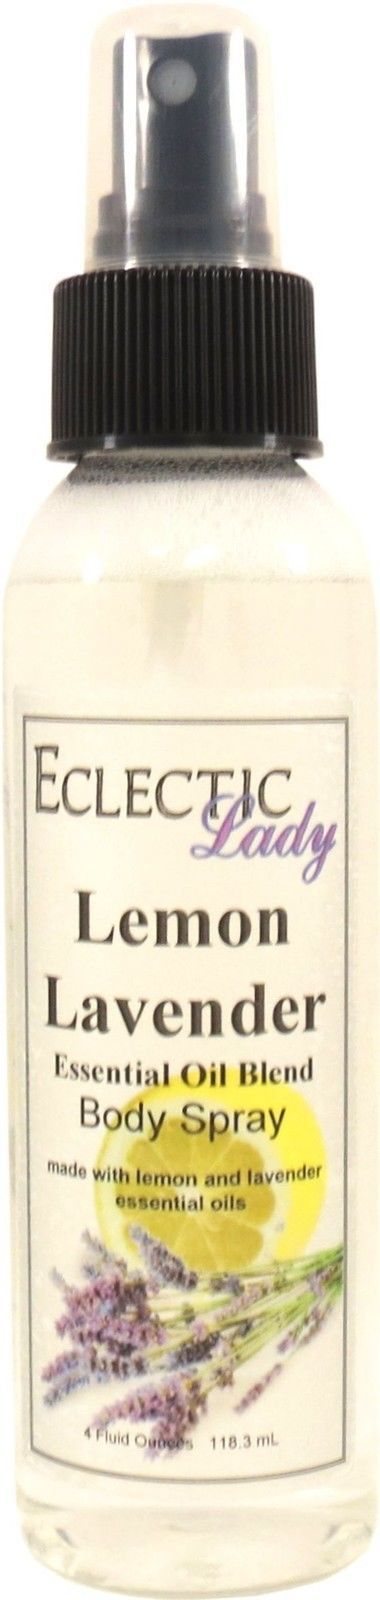 Lemon Lavender Essential Oil Blend Body Spray